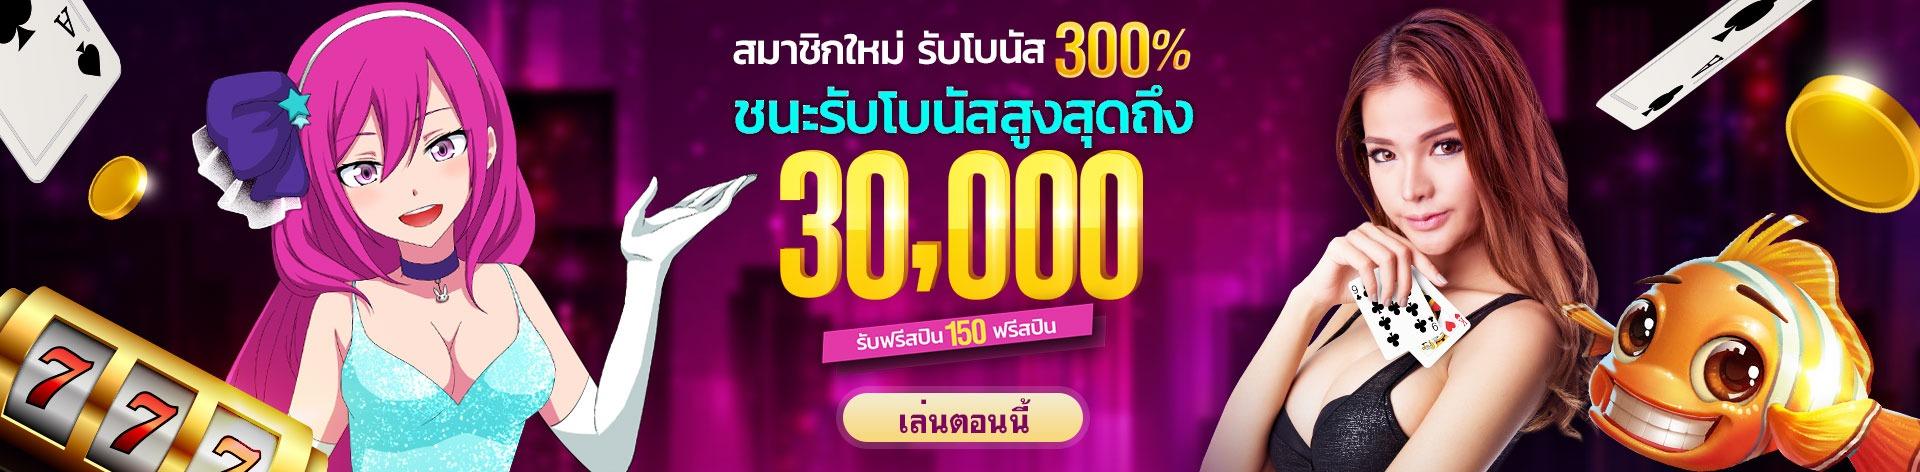 LuckyNiki แจกโบนัสฟรี 300%